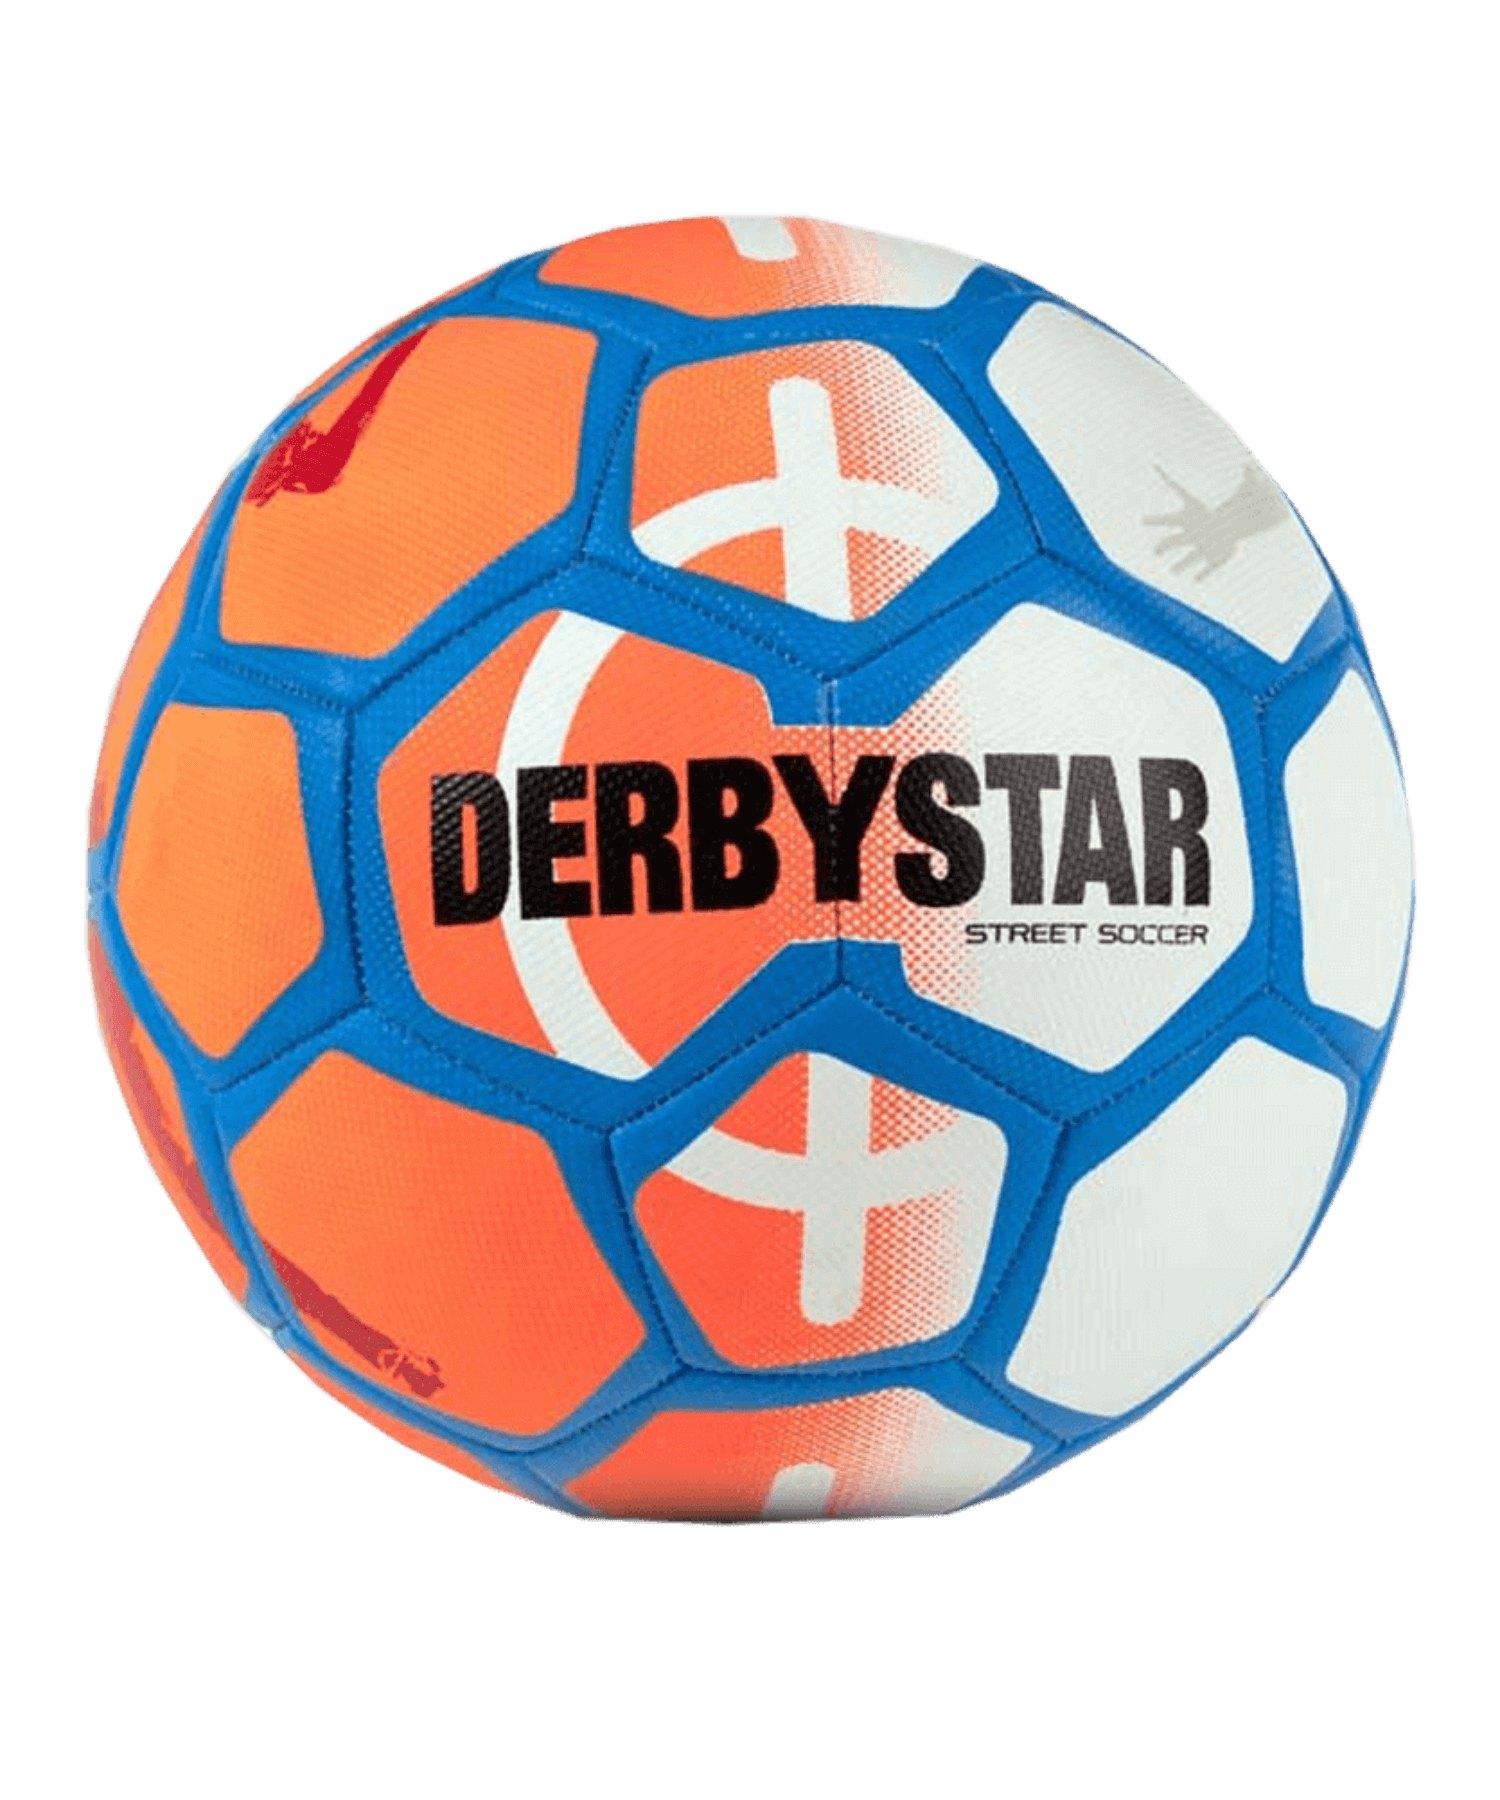 Derbystar Street Soccer Fussball Orange Weiss F716 - orange